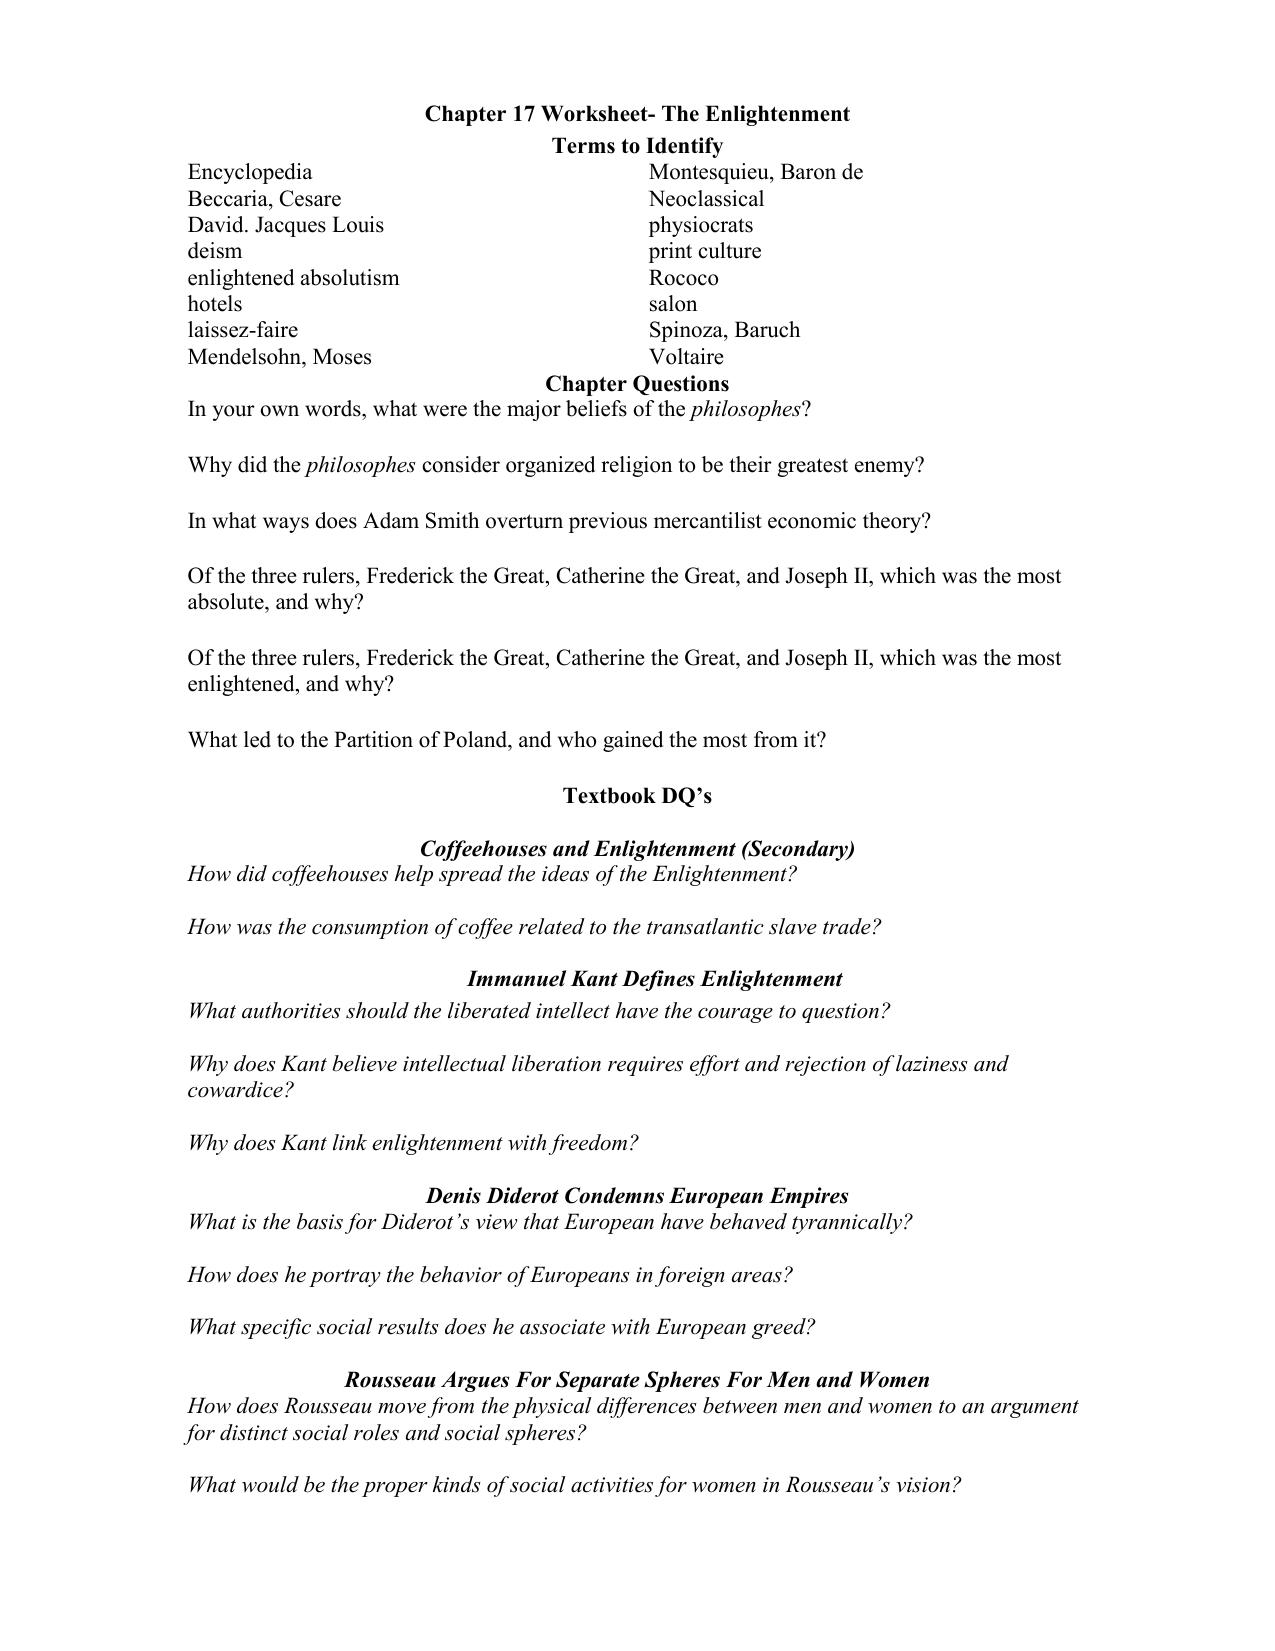 worksheet Enlightenment Worksheet chapter 17 worksheet the enlightenment apeh